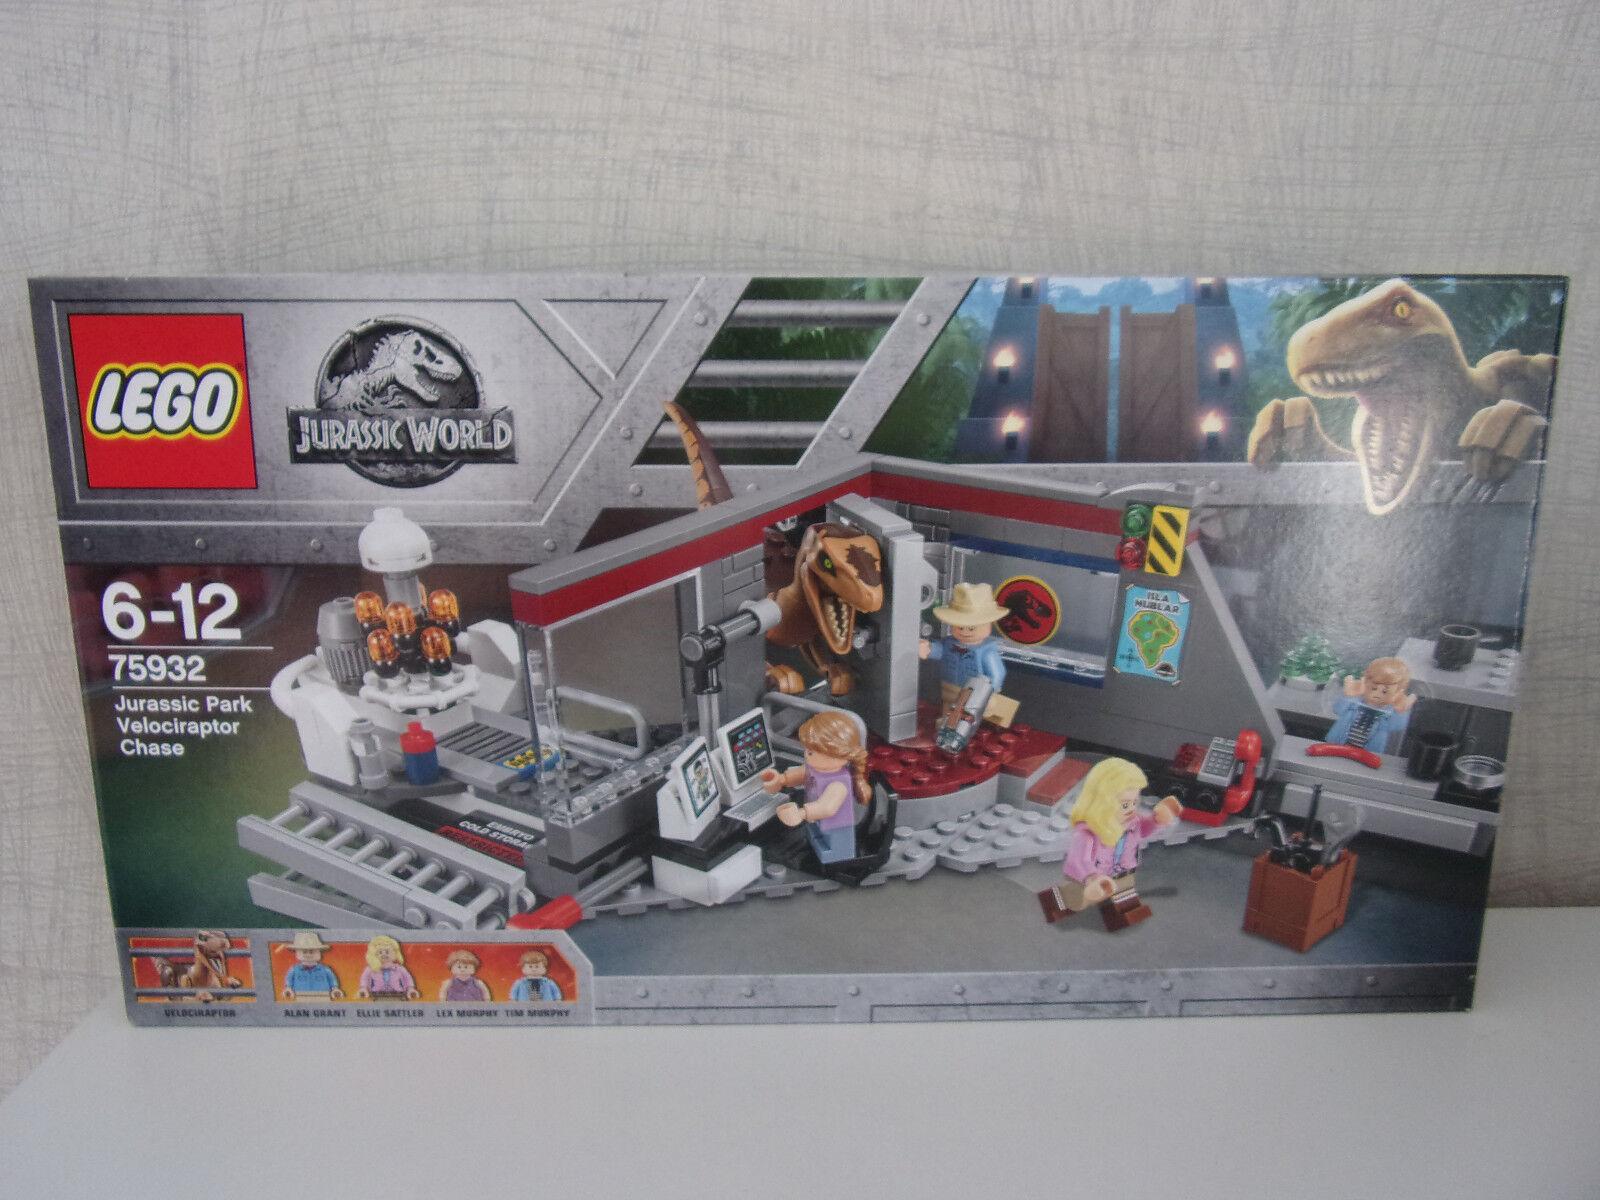 LEGO Jurassic World 75932 Jurassic Park Velociraptor Chase-NUOVO & OVP